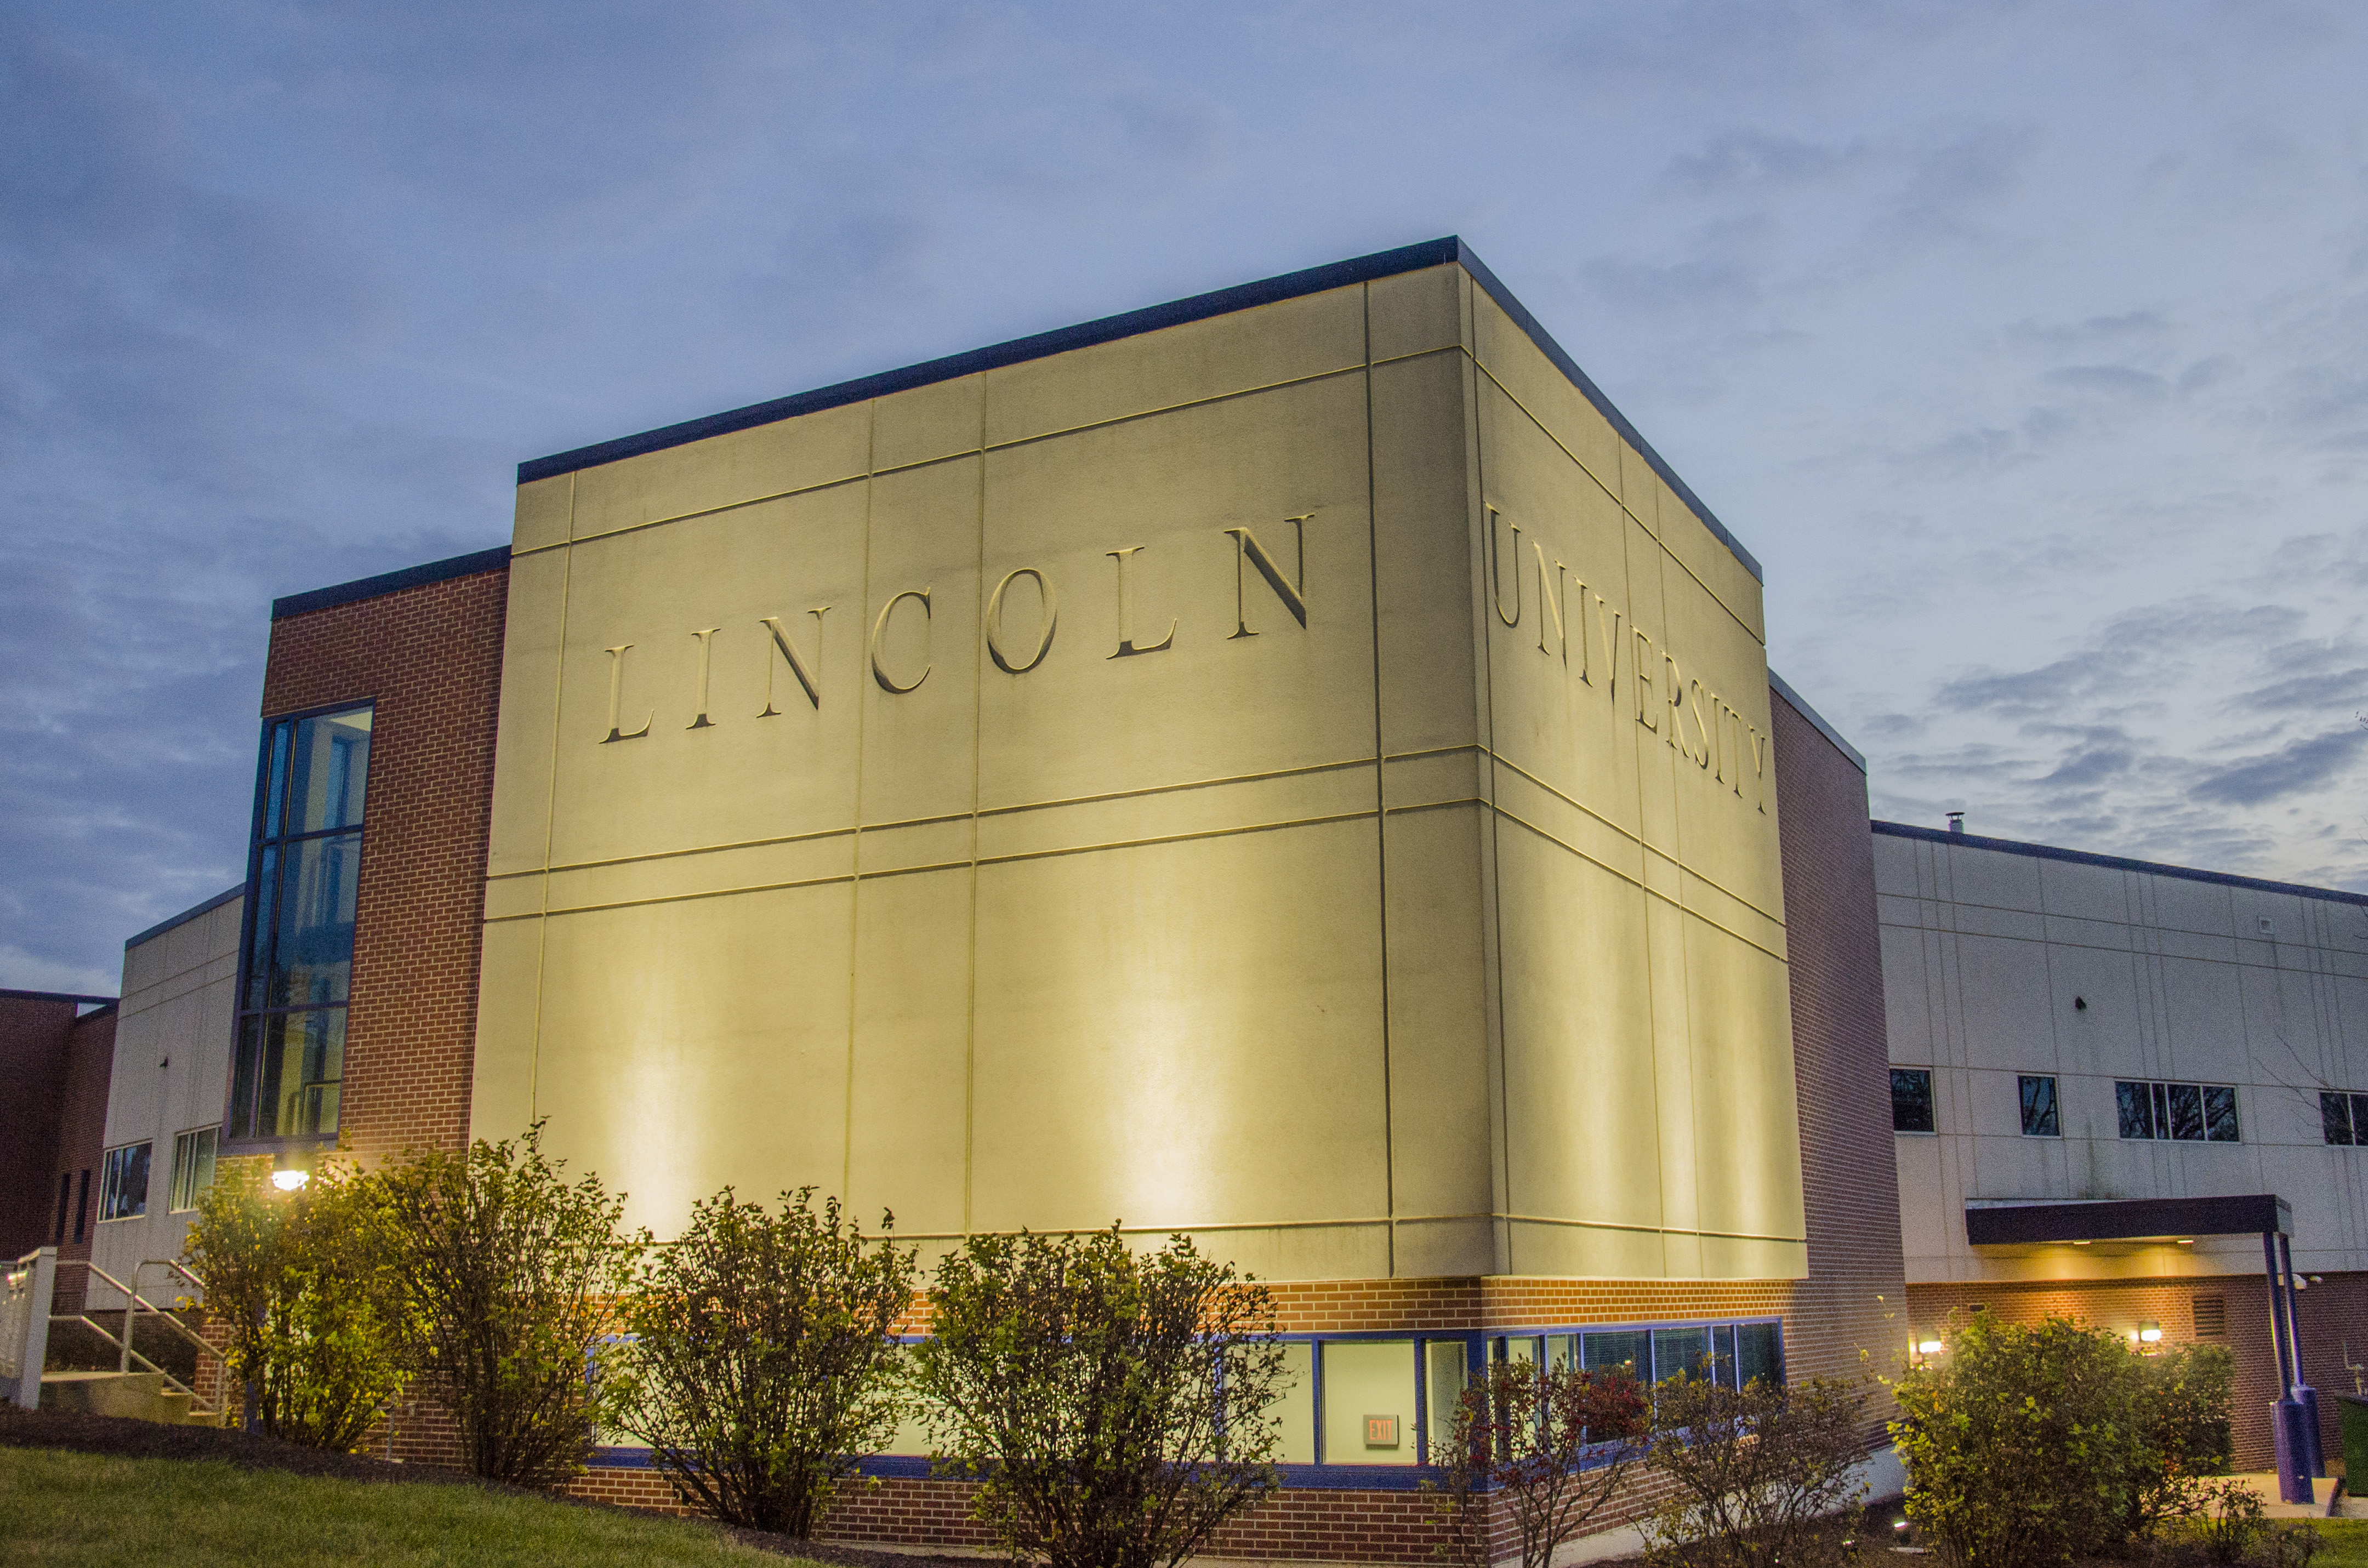 Study: Lincoln University Generates $115 Million in Economic Impact